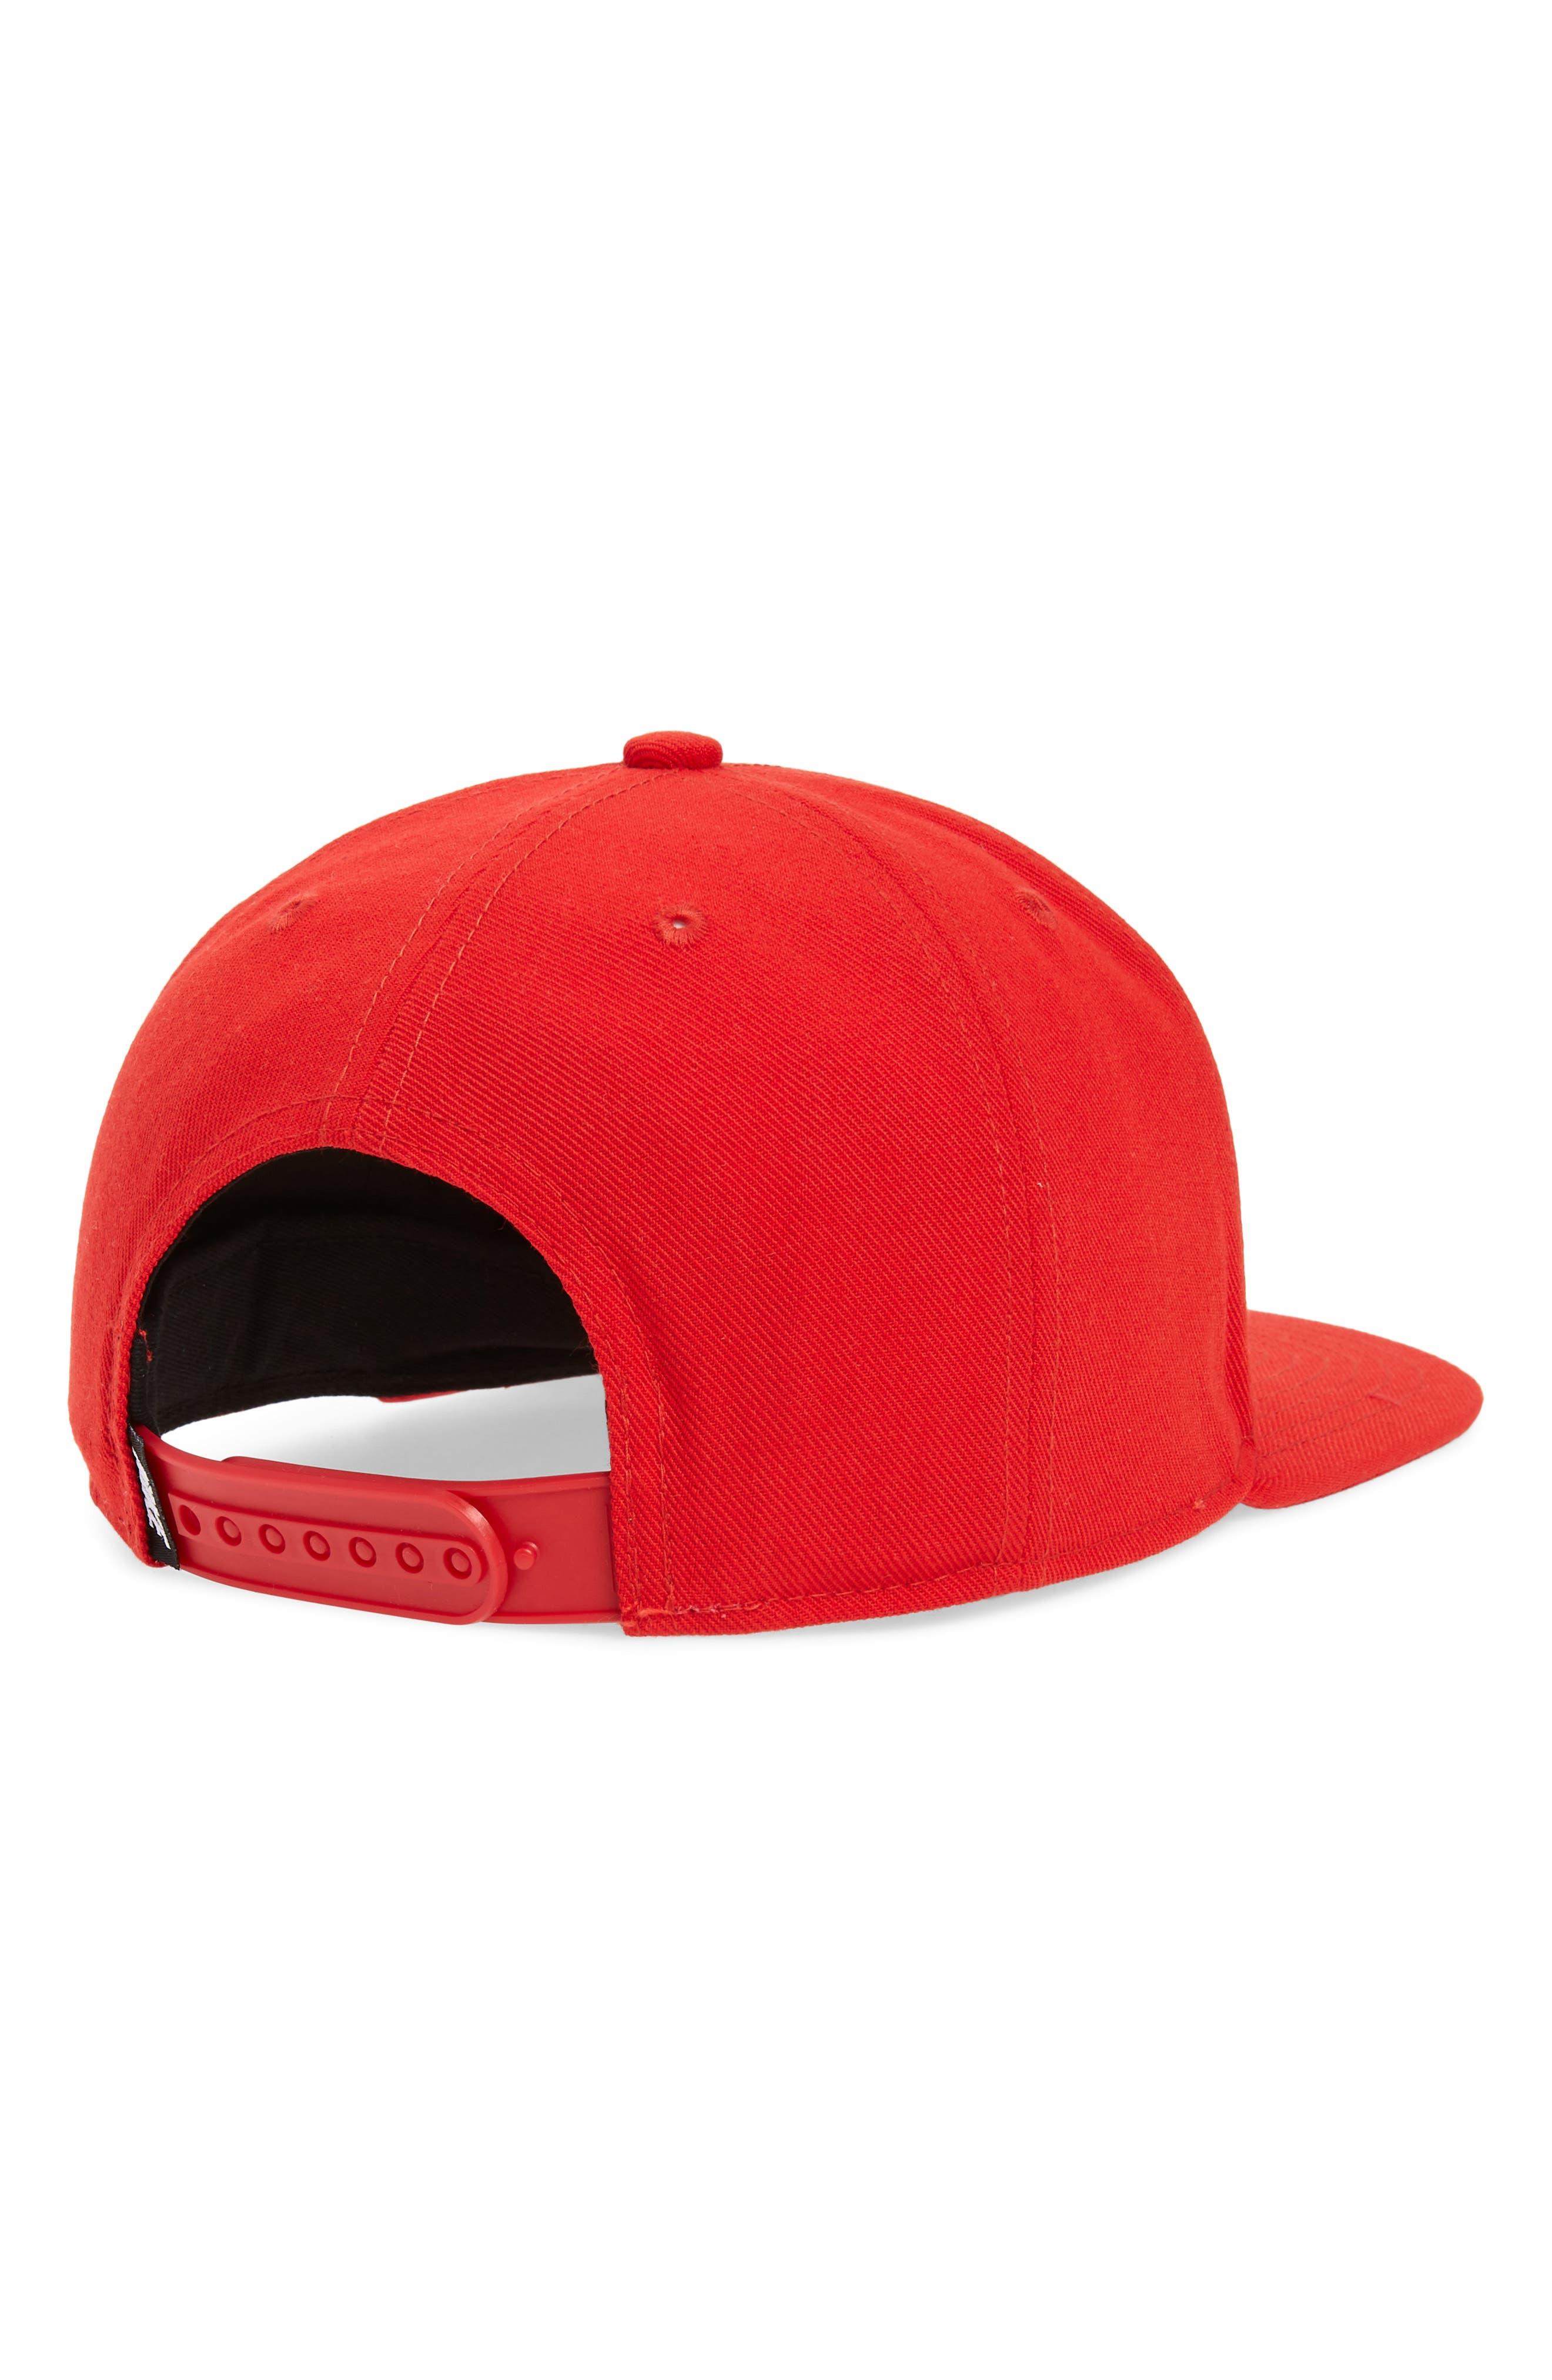 NIKE, Air Pro Snapback Baseball Cap, Alternate thumbnail 2, color, UNIVERSITY RED